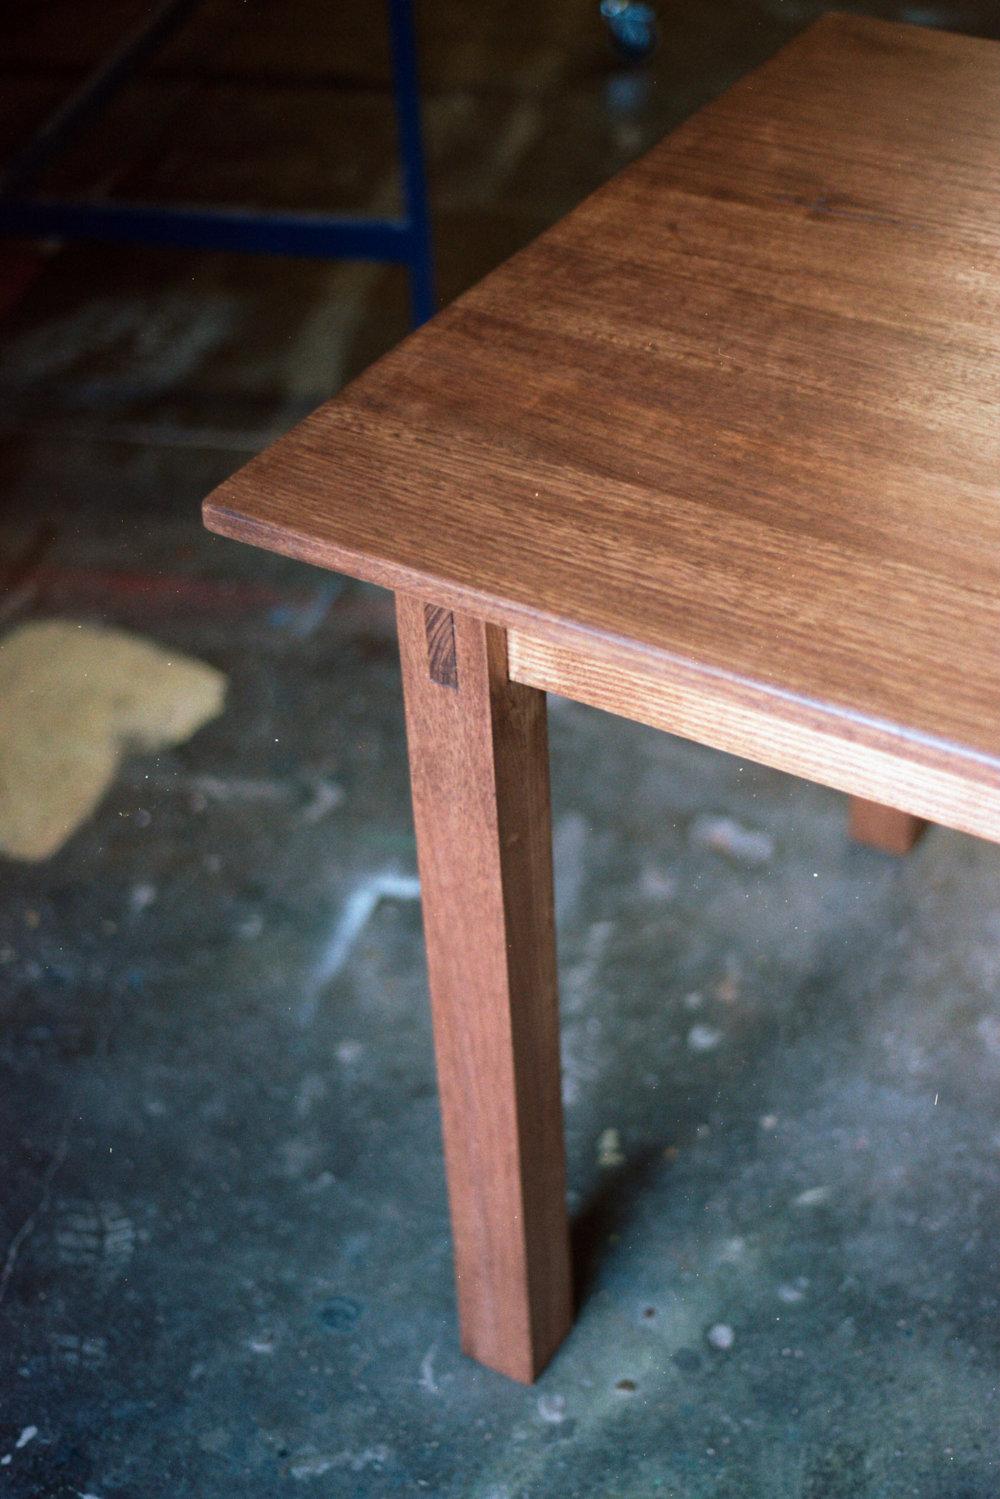 Corner close-up shot of study table top